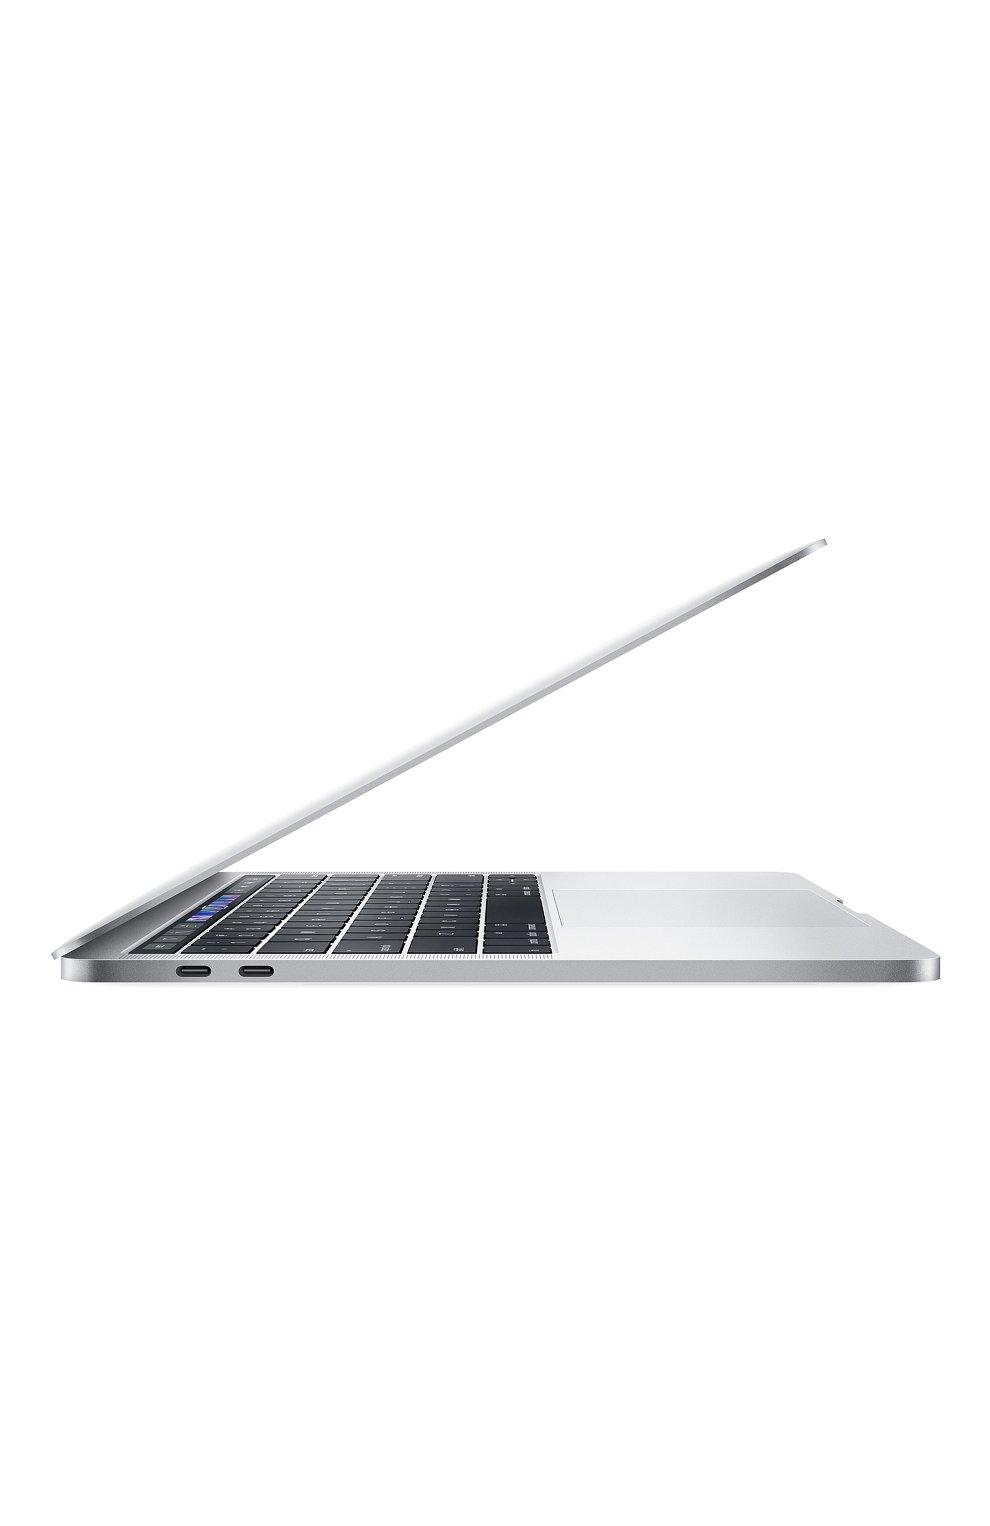 "MacBook Pro 13"" с панелью Touch Bar со встроенным датчиком Touch ID Quad-Core i5 2.3GHz 512GB Silver Apple  | Фото №2"